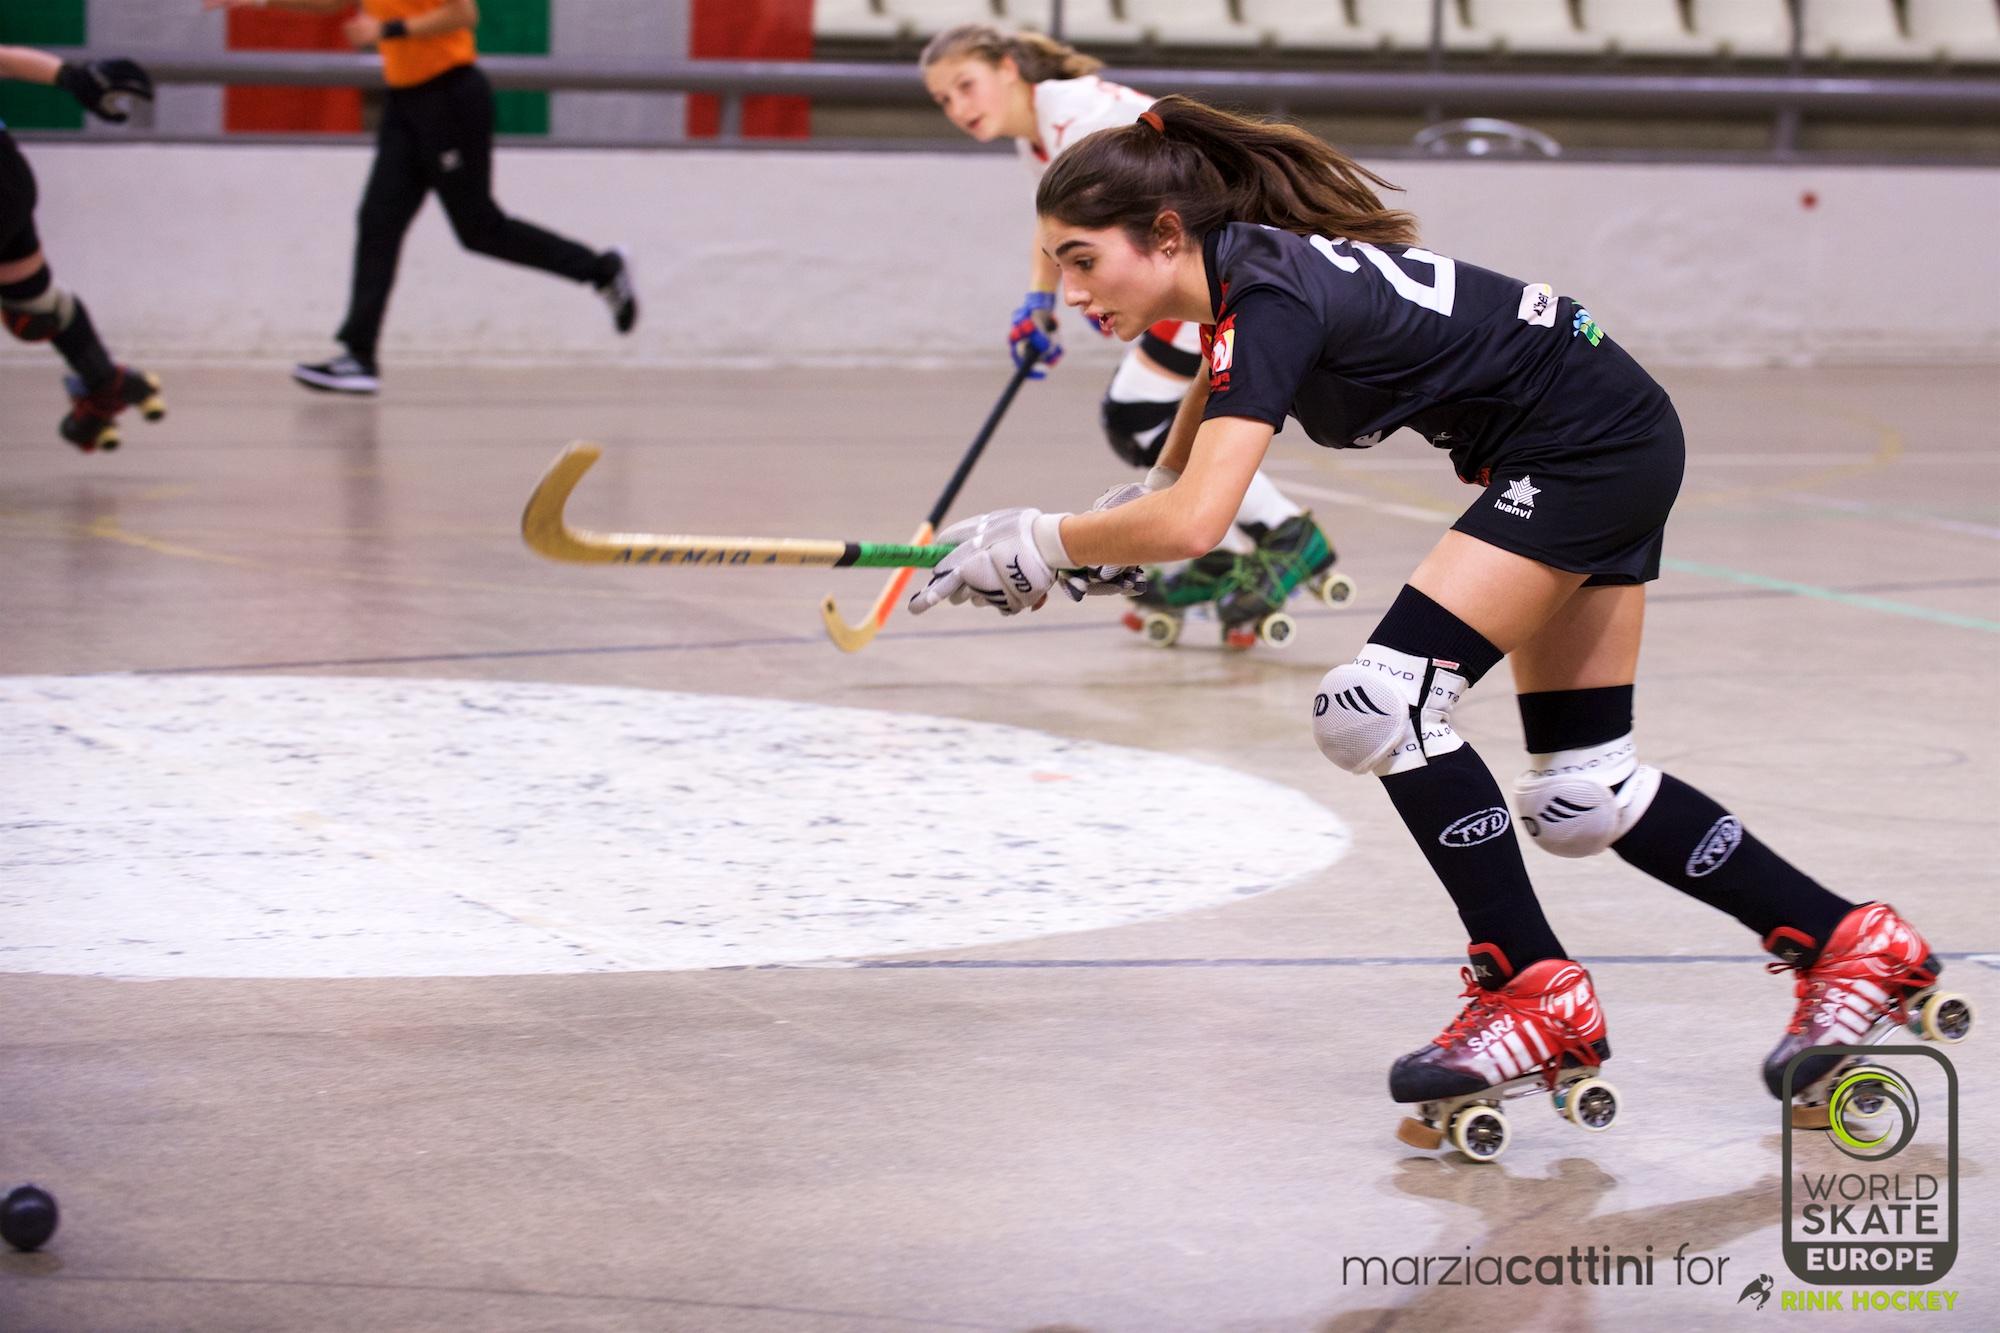 18-12-15_5-SwissFuture-GijonHC05